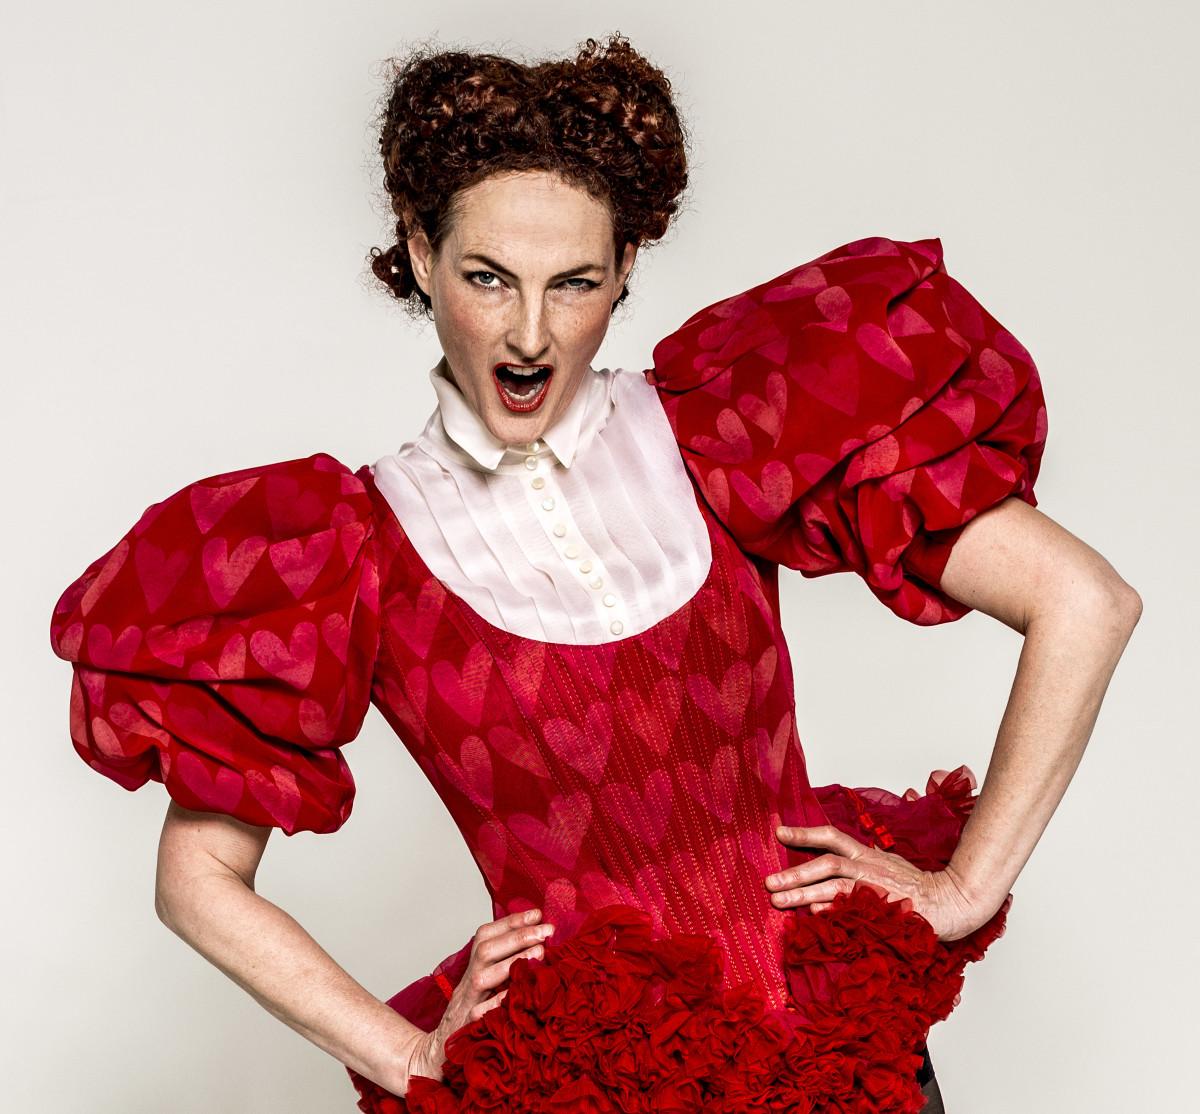 Photo: Mats Bäcker, Costume: Anna Ardelius